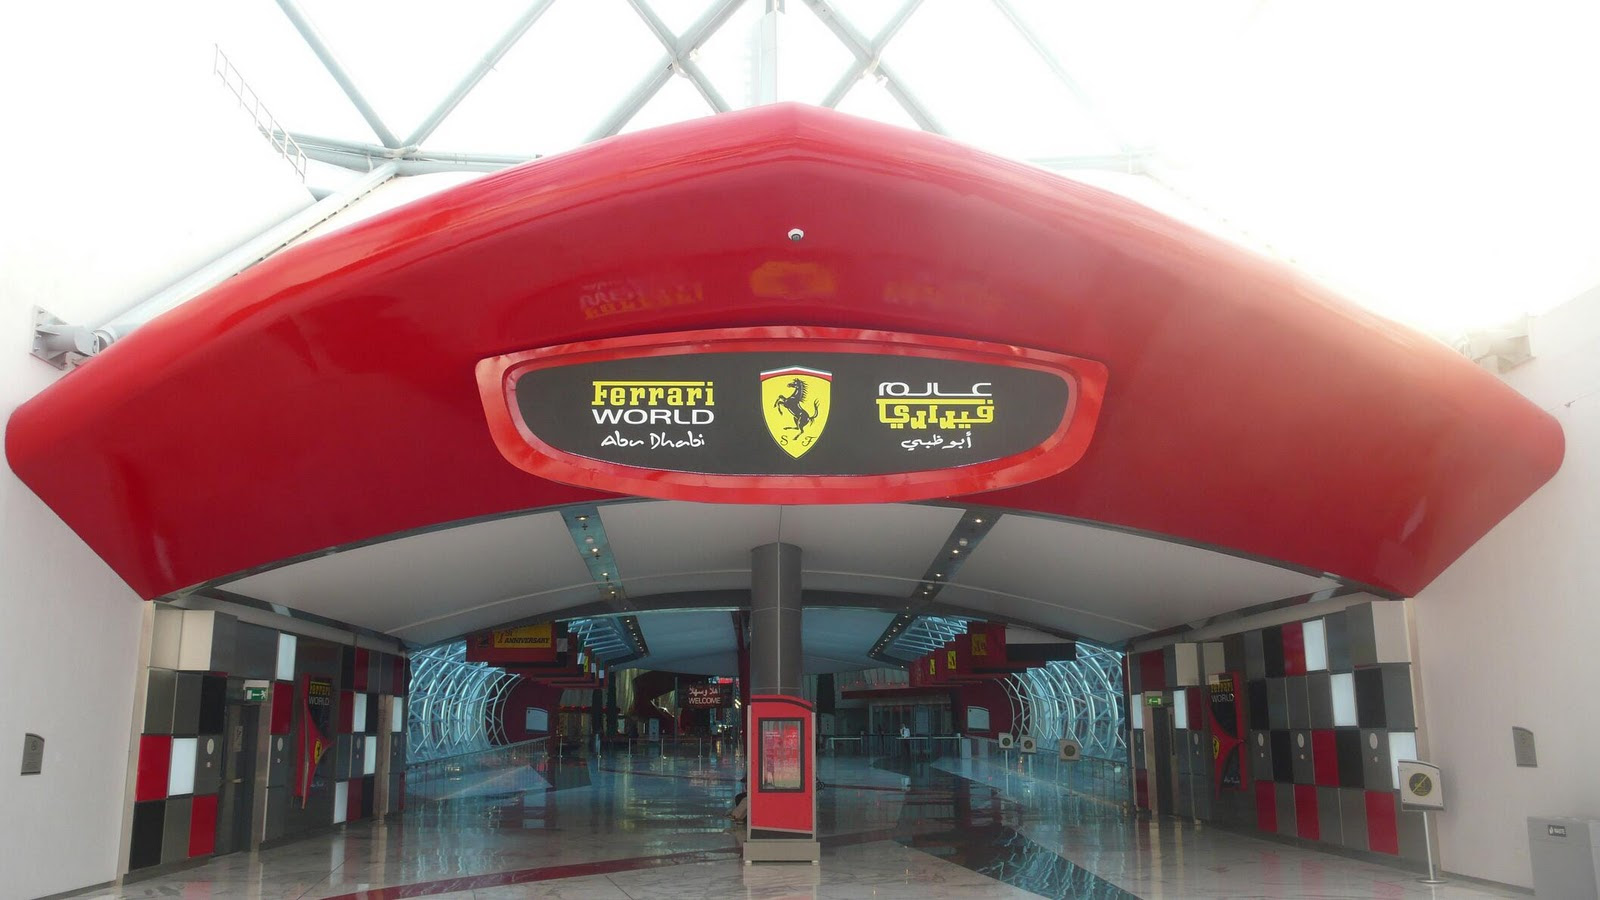 Formula Rossa (World's Fastest Roller Coaster) at Ferrari World, Abu Dhabi | Welcome to KidzSpeed!